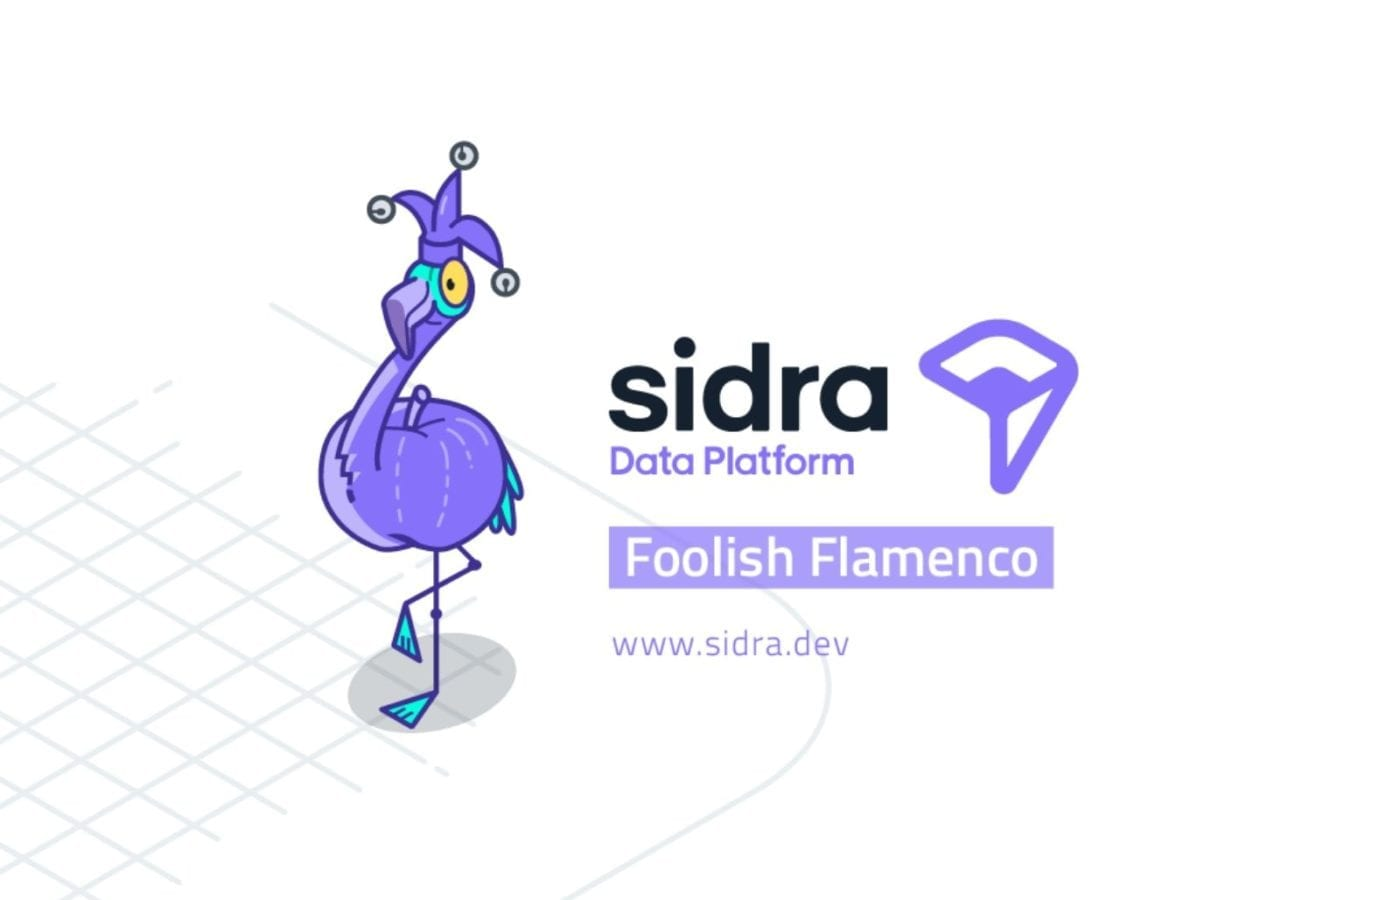 Sidra new release